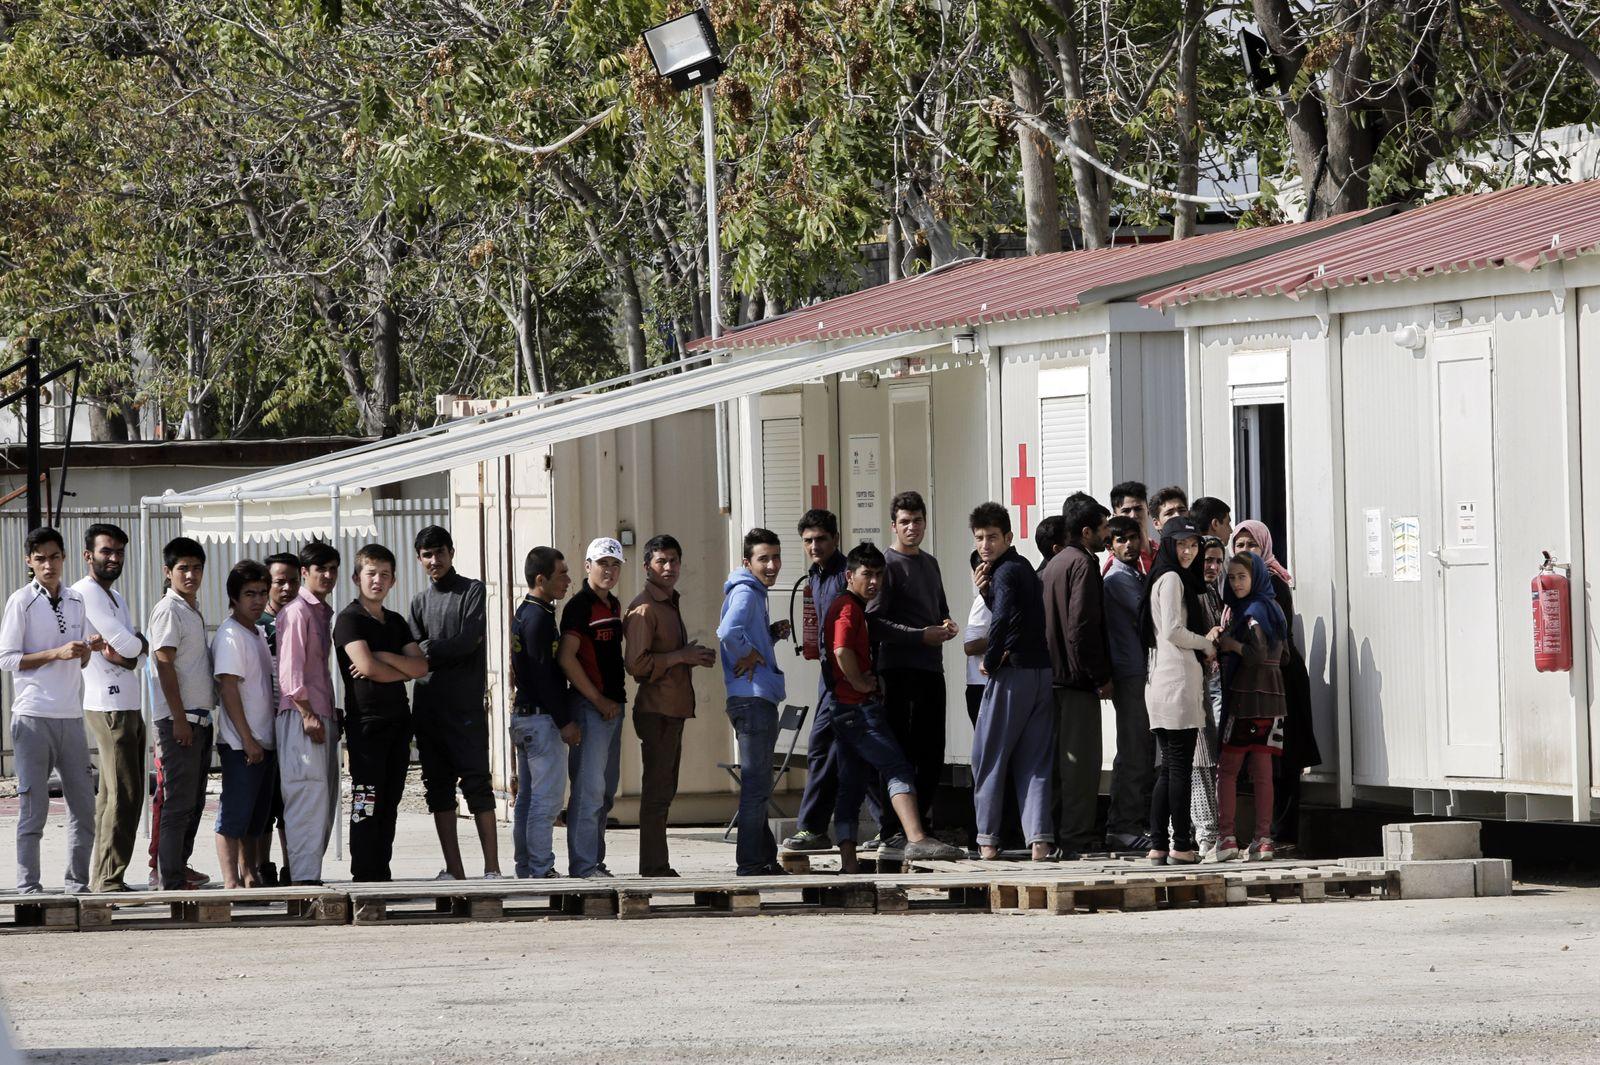 Griechenland / Eleonas / Flüchtlinge / Flüchtlingscamp